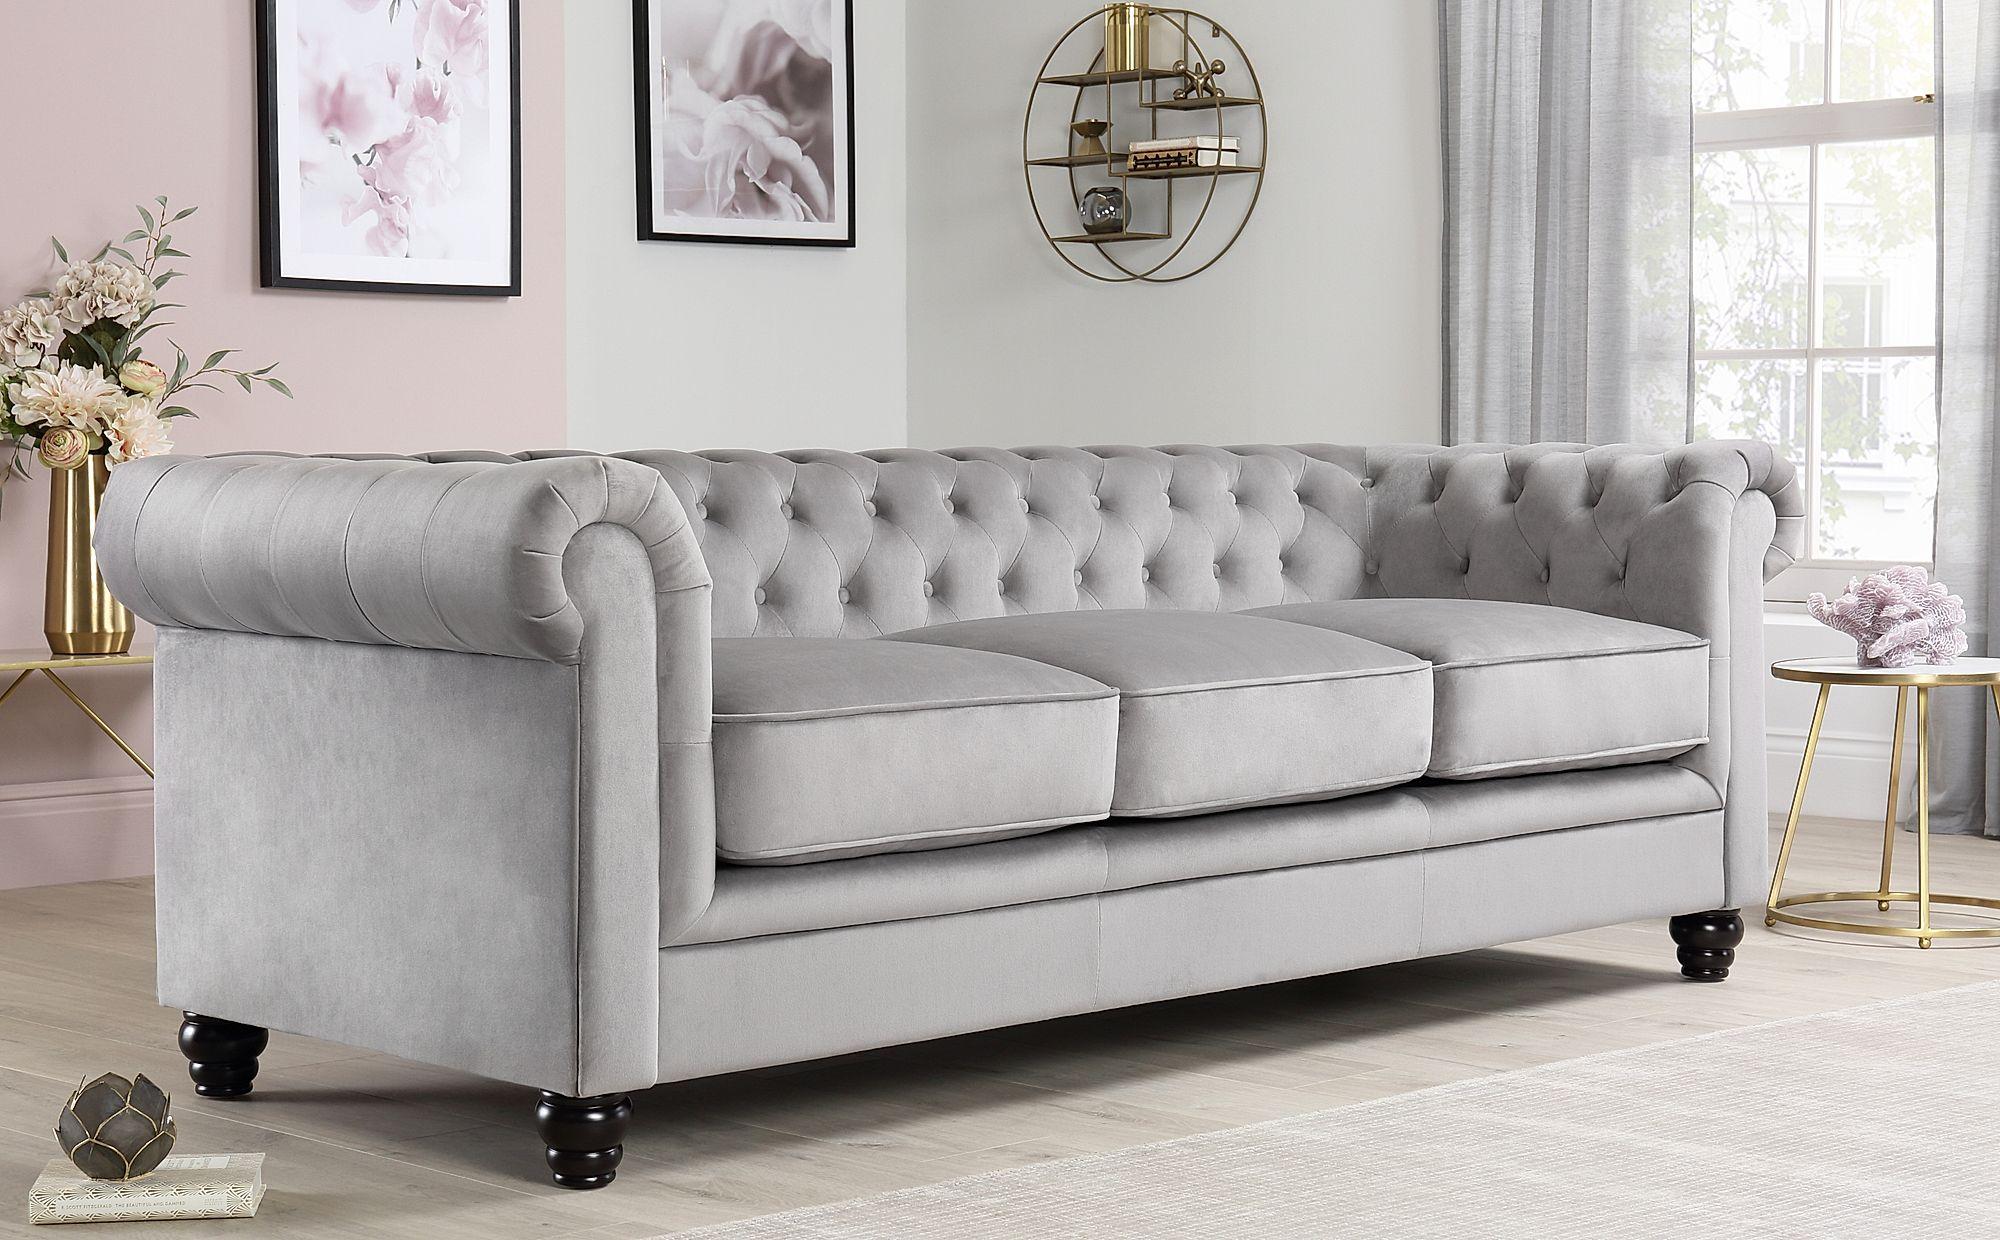 Hampton Grey Velvet 3+2 Seater Chesterfield Sofa Set